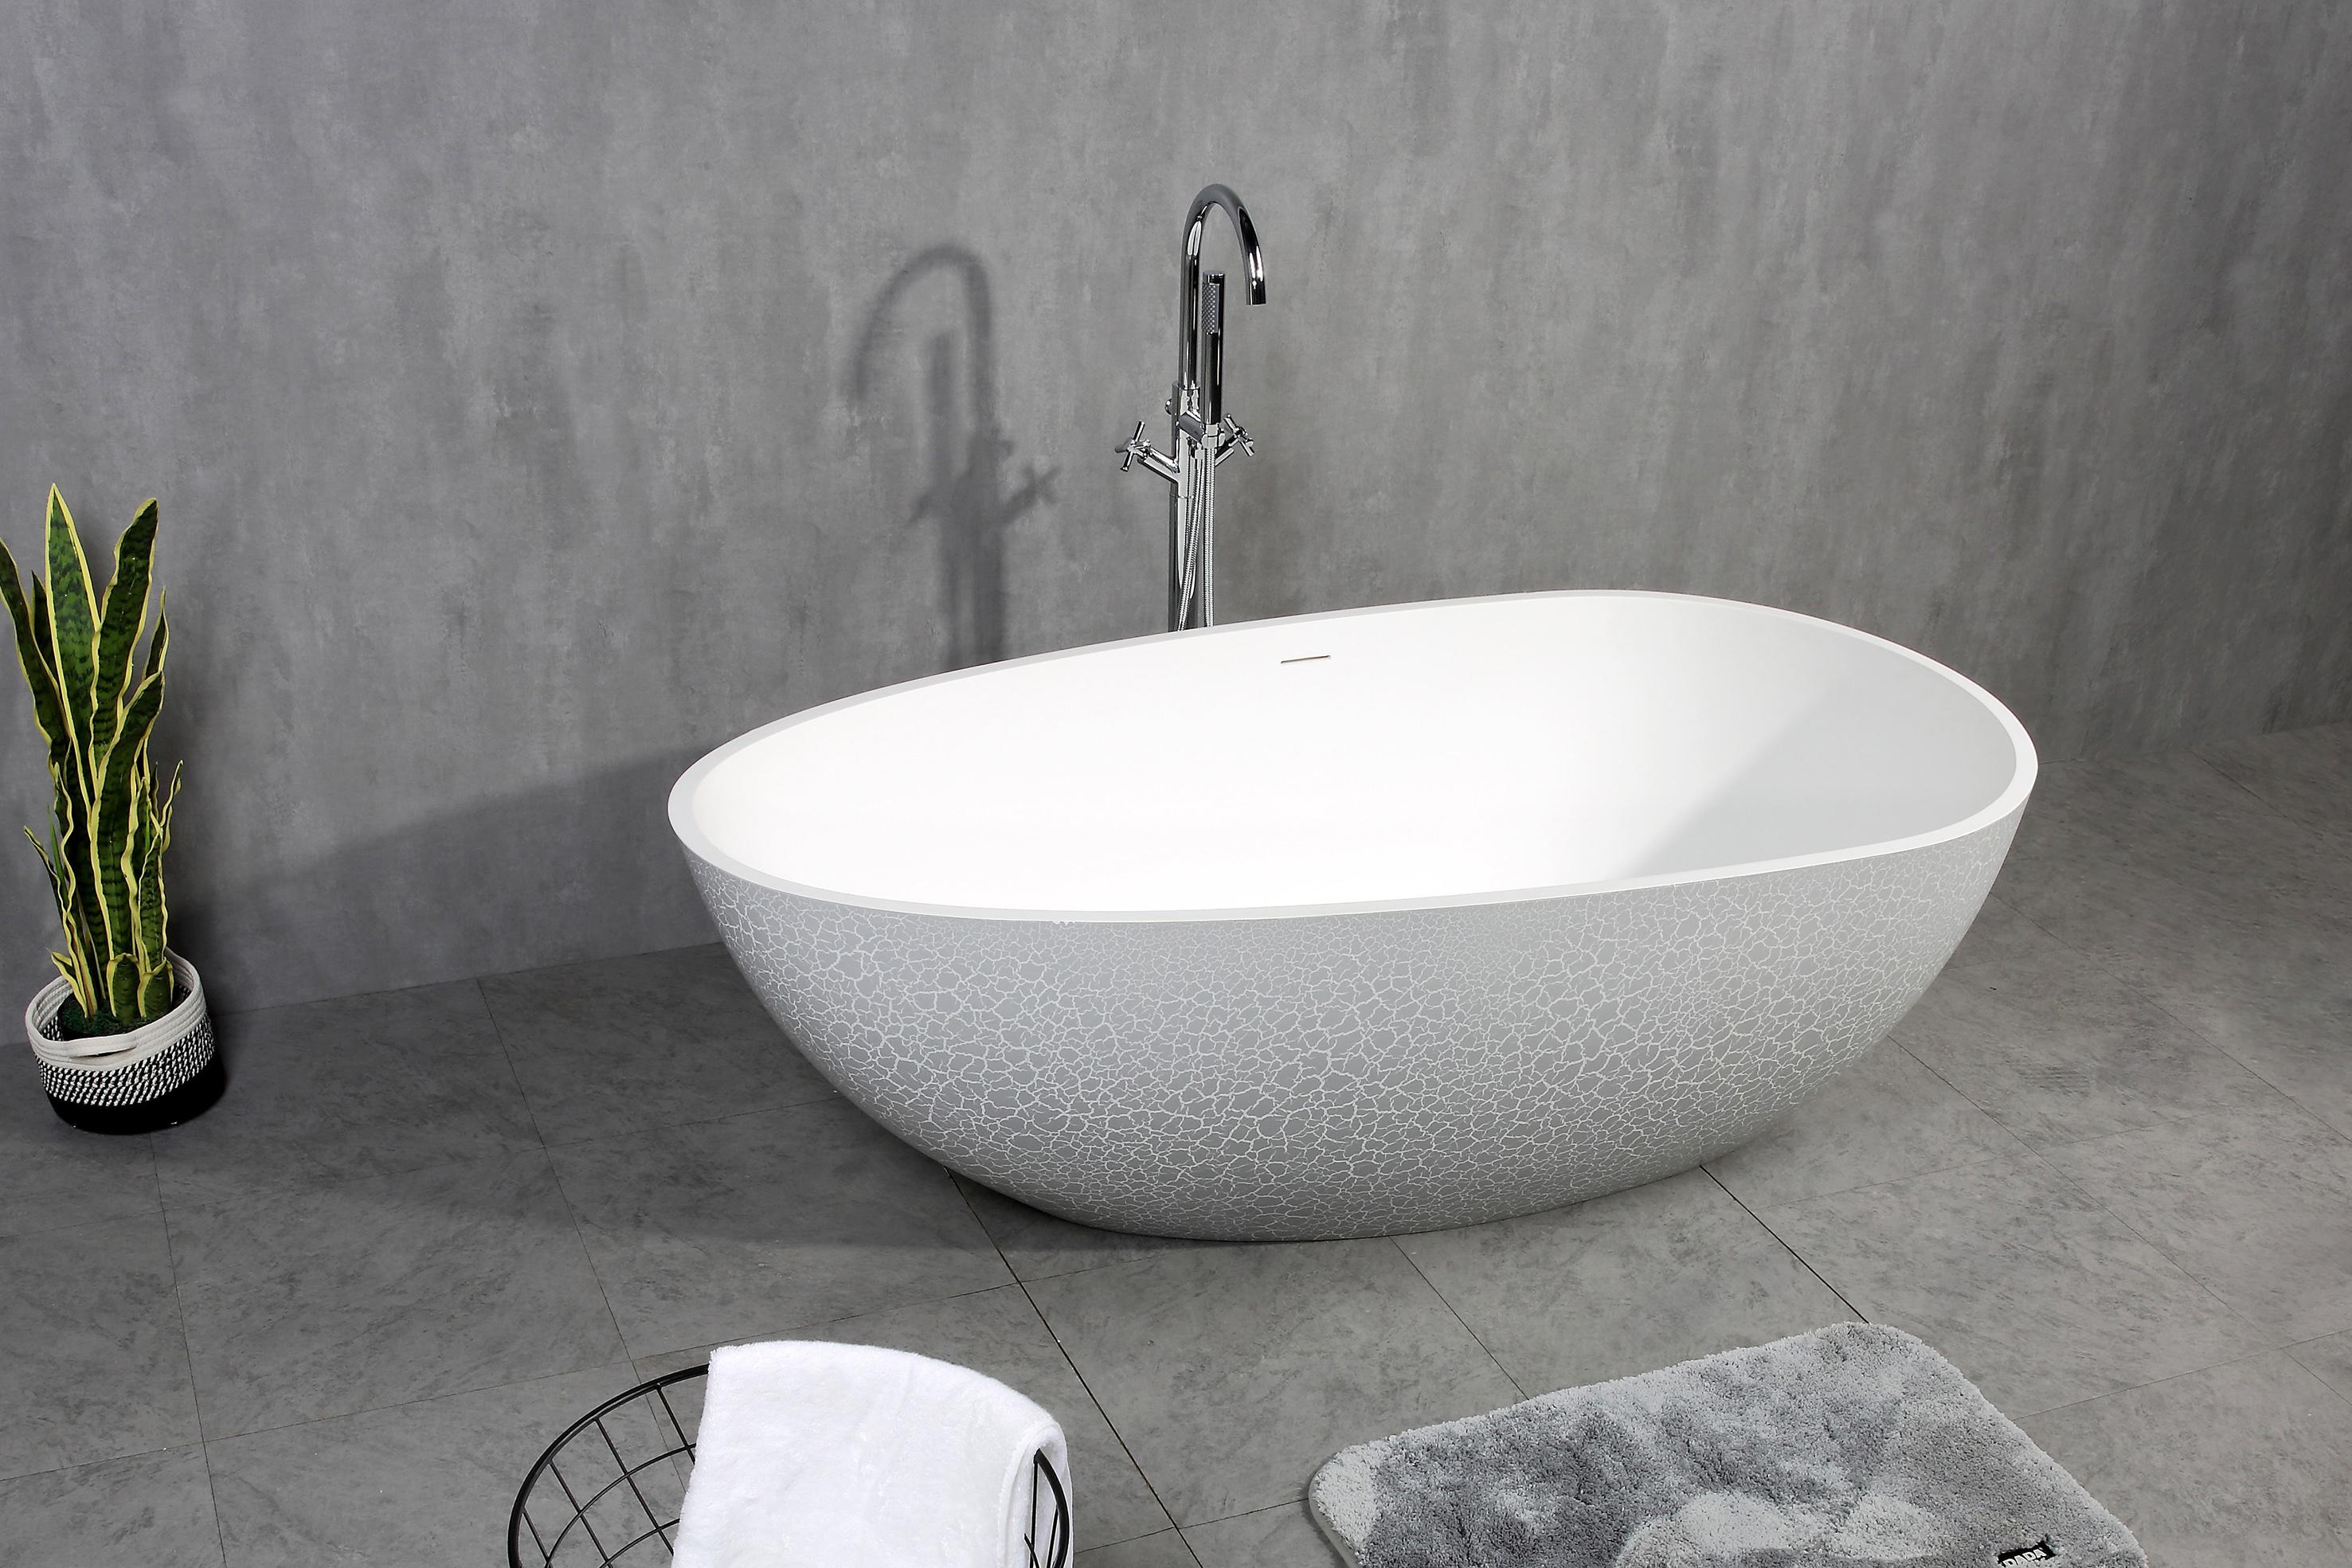 Freistehende Badewanne aus Mineralguss OCEANIA - 170x85cm - Vintage Stil grau matt